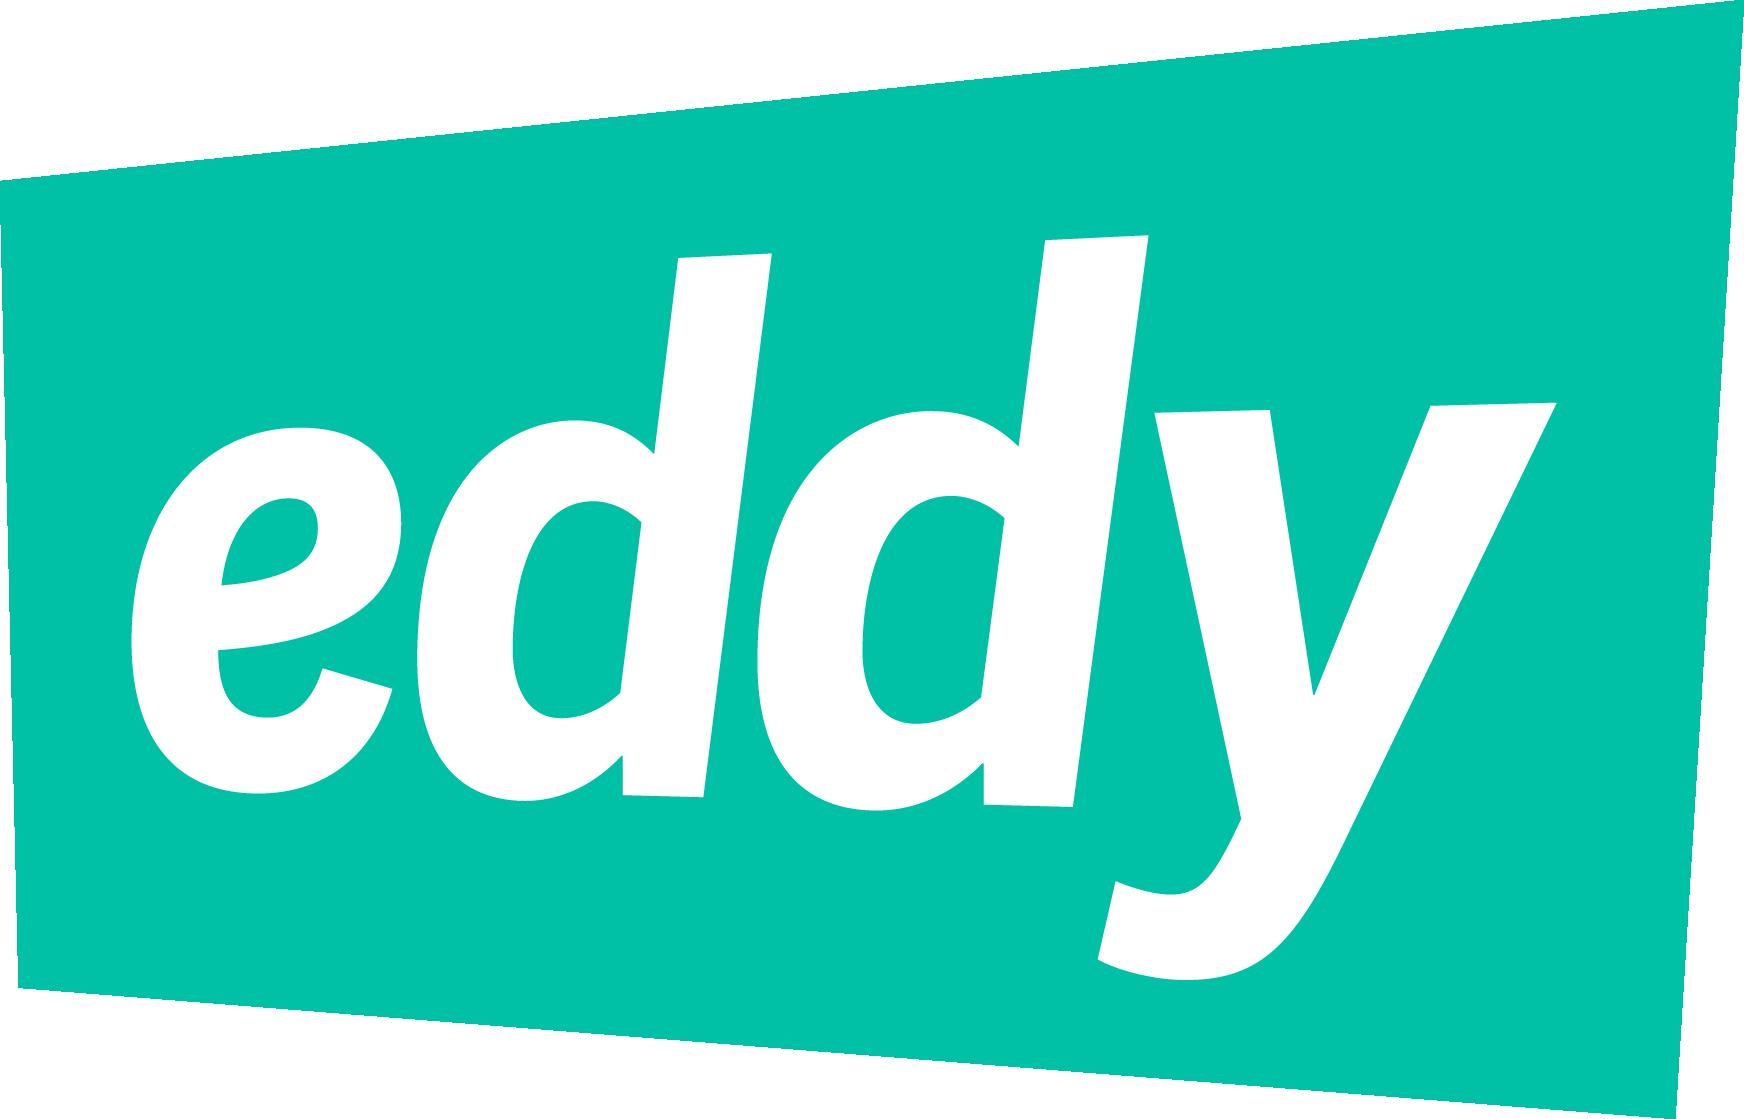 Eddy - Cannabis Delivery Service